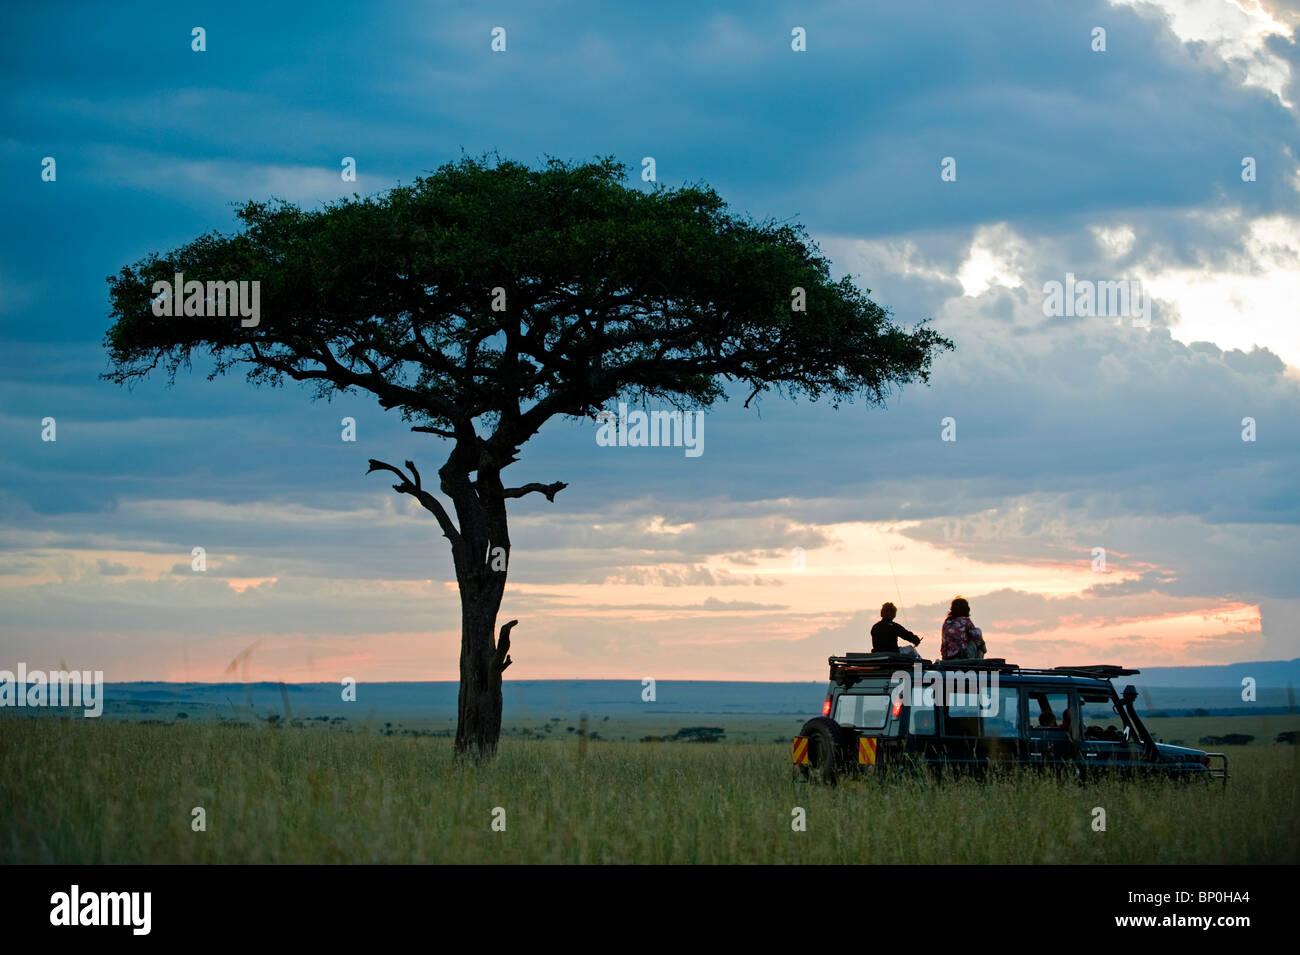 Kenya, Masai Mara. A pause for a sundowner beneath a balanites tree during a game drive on a family safari. (MR) - Stock Image